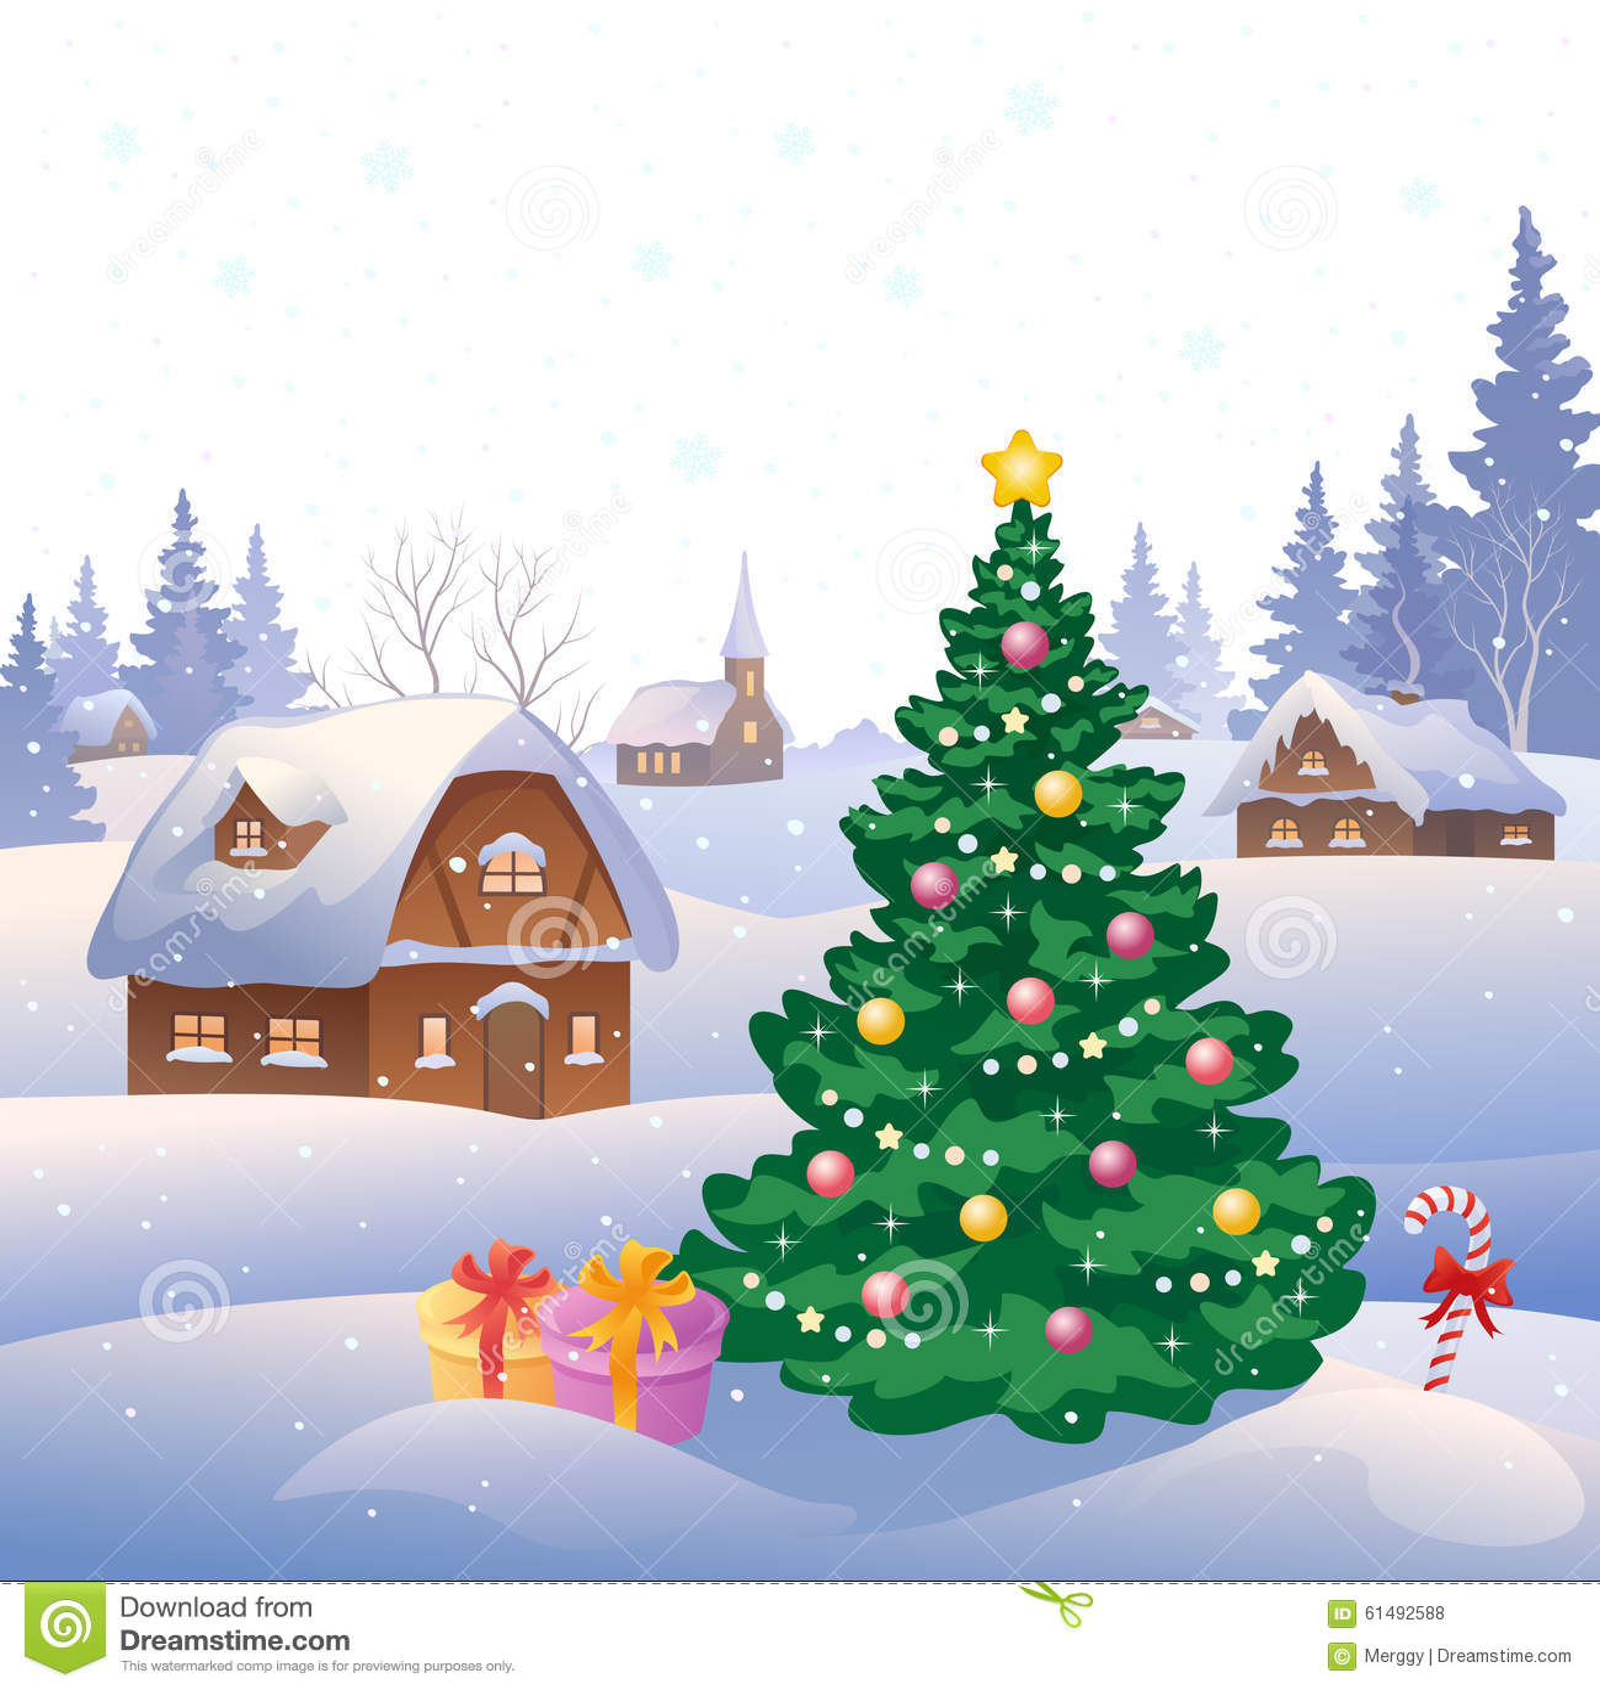 free christmas village clipart - photo #21